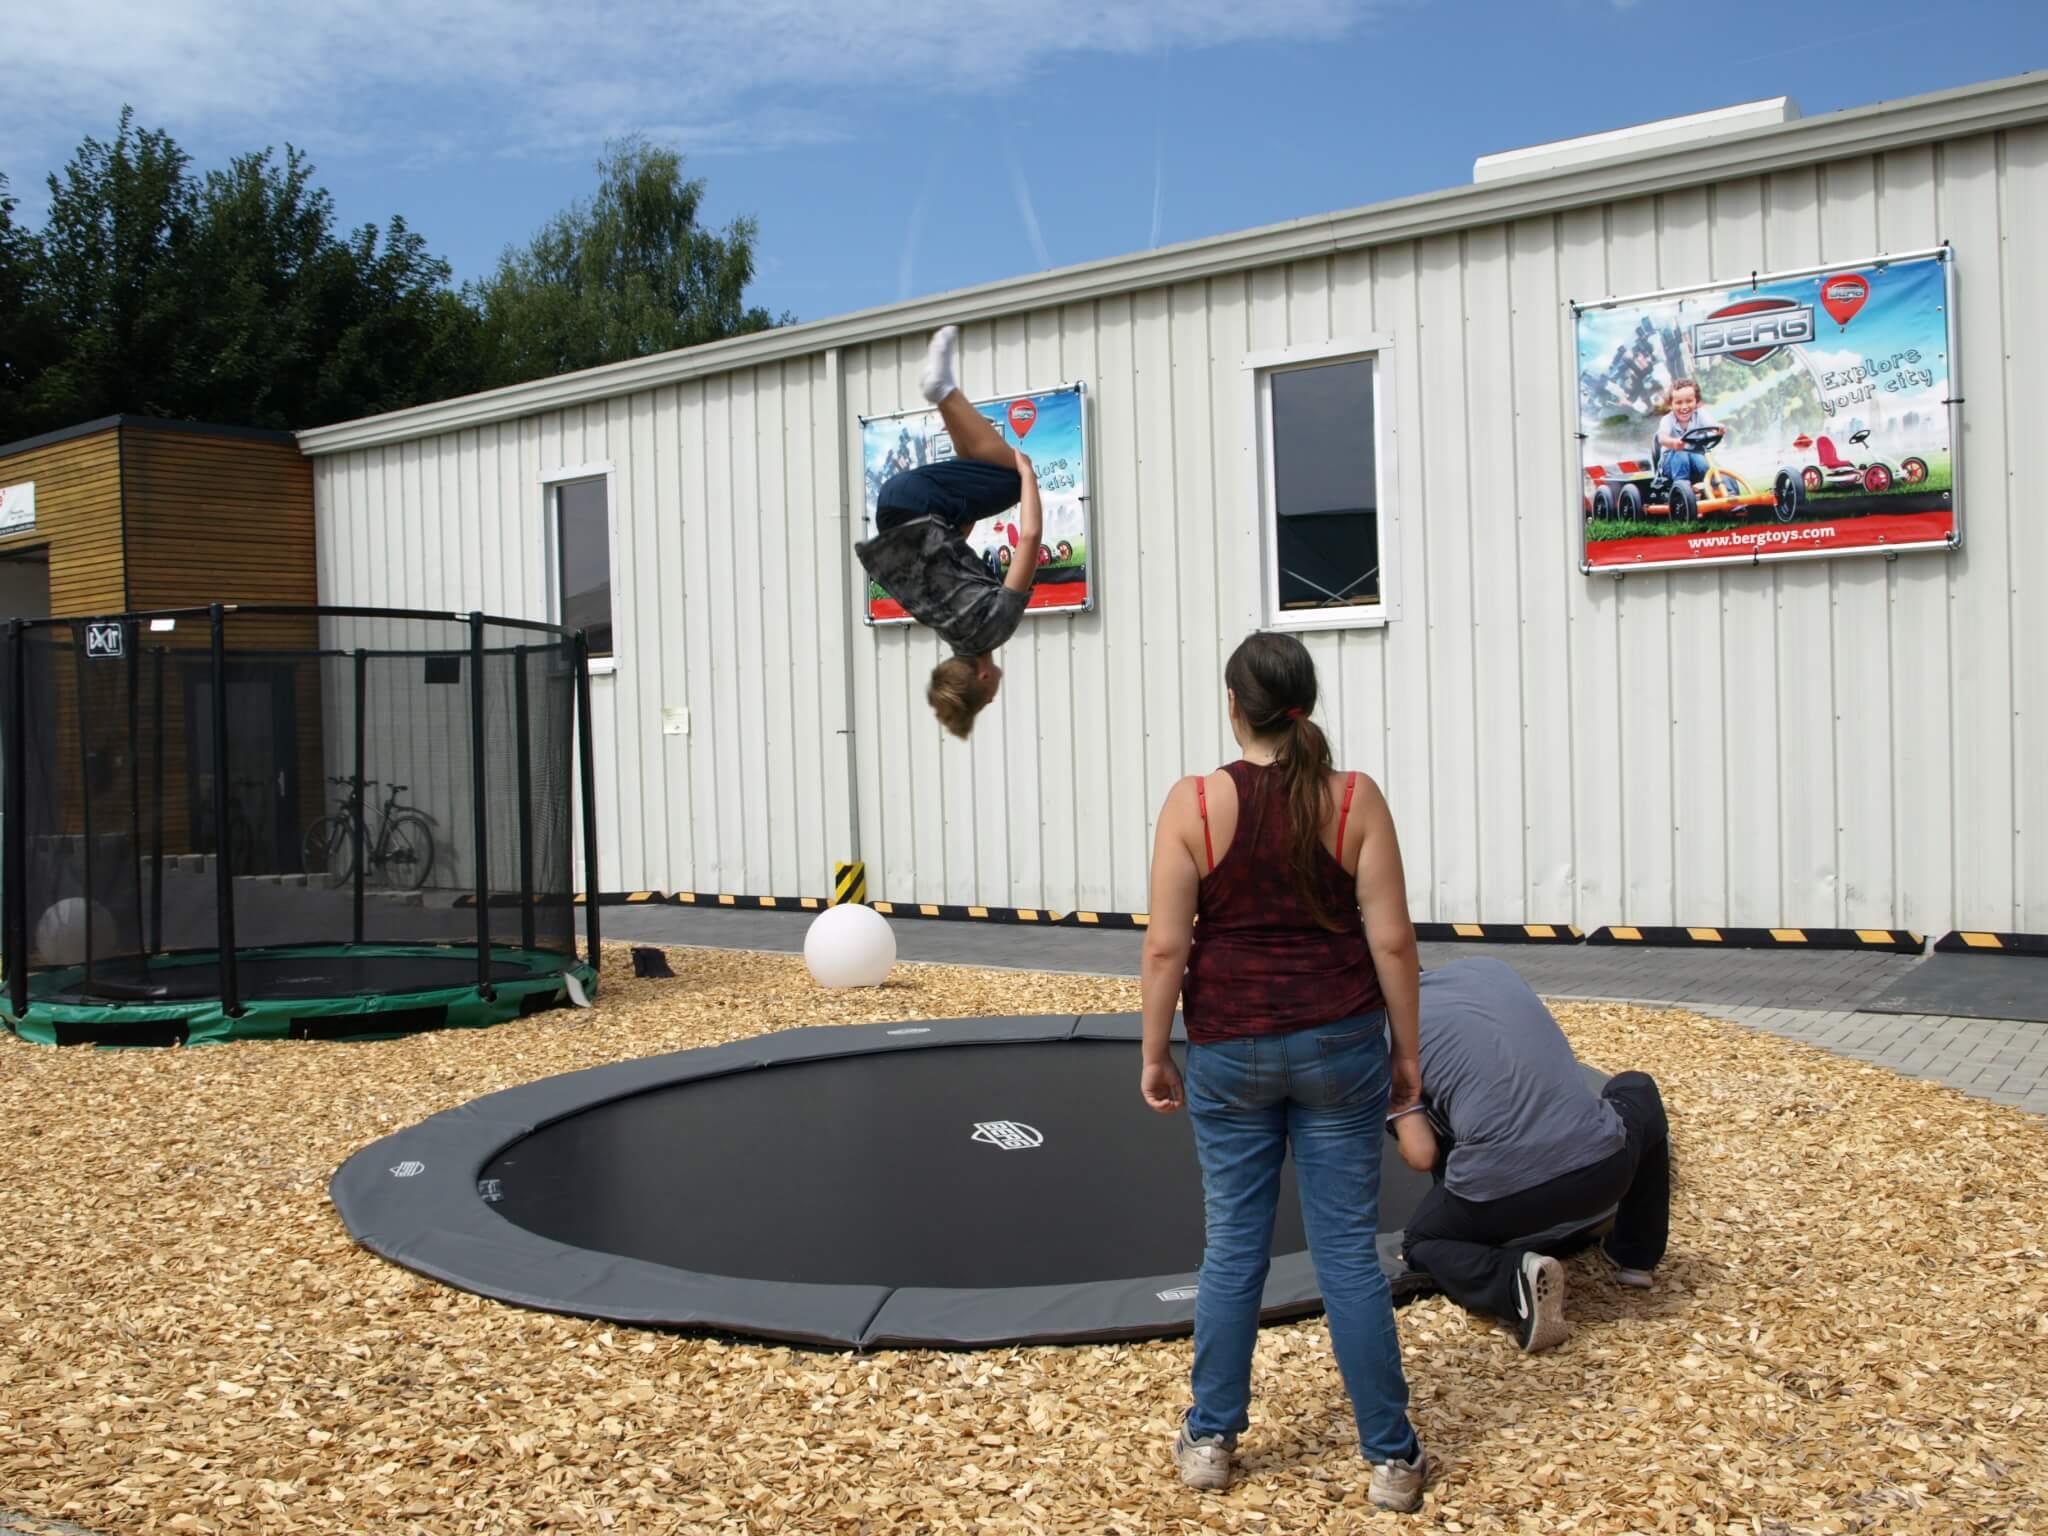 Trampolingröße richtig ermitteln - Ratgeber trampolin-profi.de